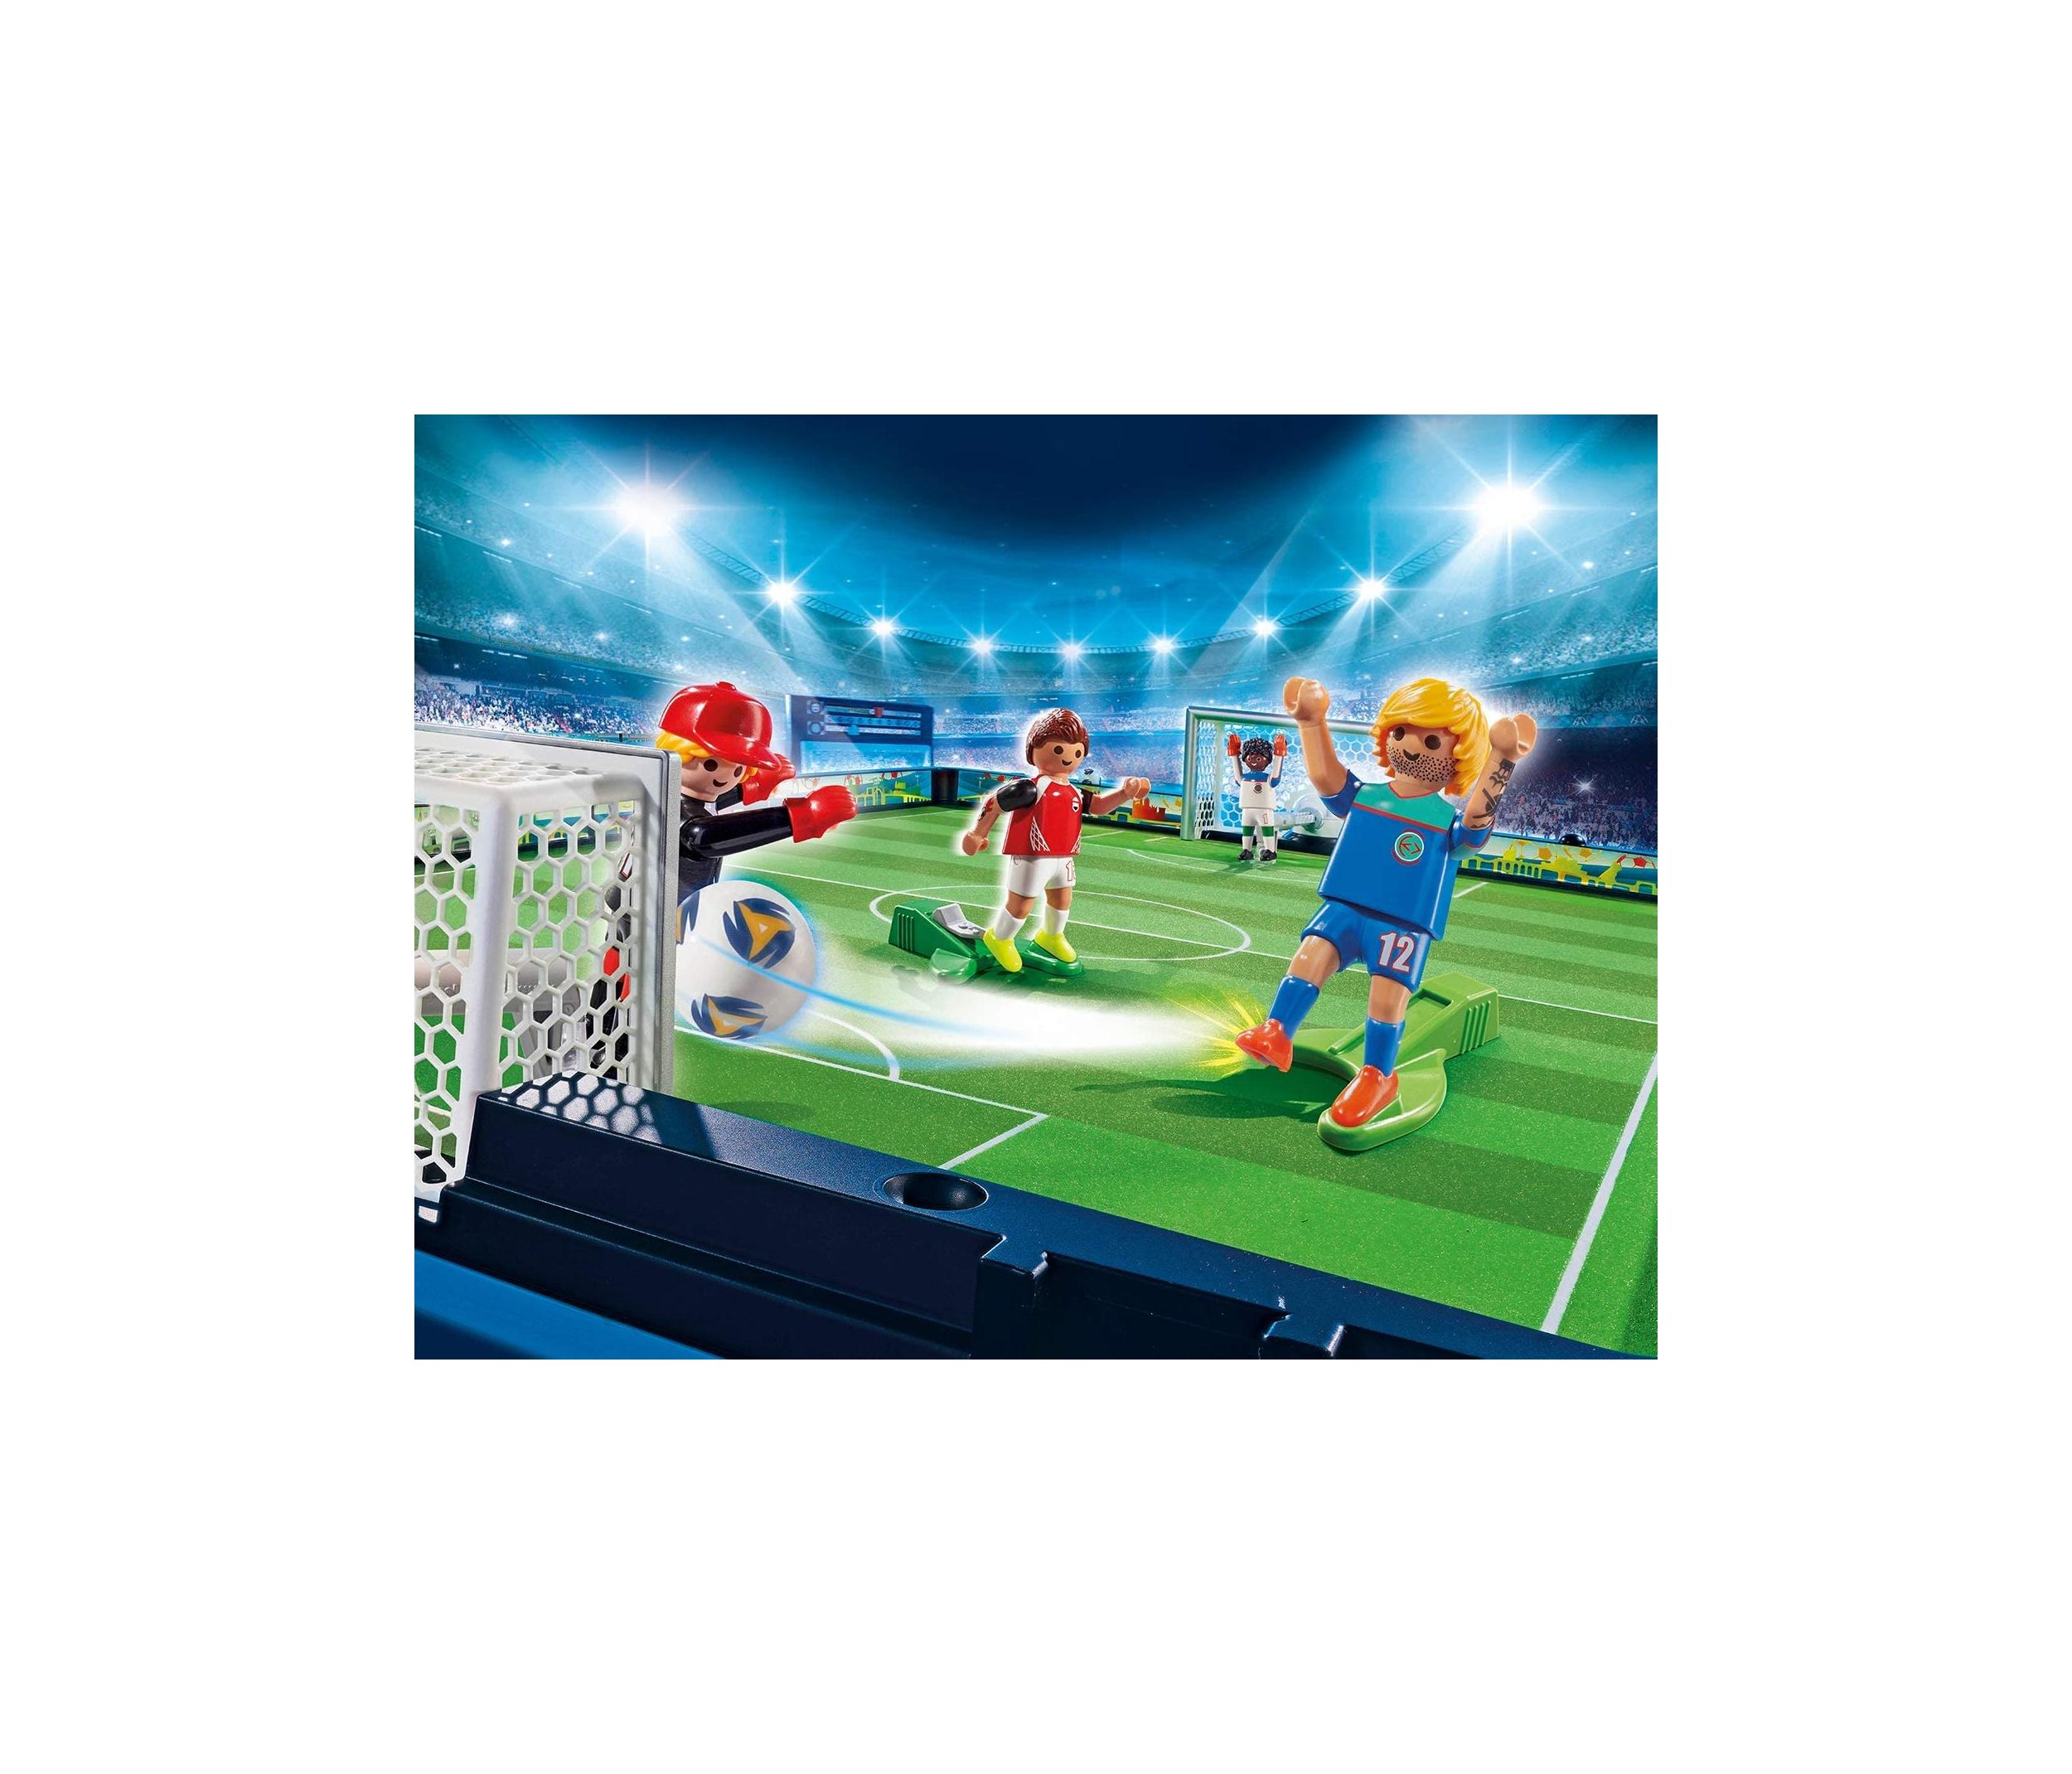 Set mobil arena de fotbal playmobil sports action - 2